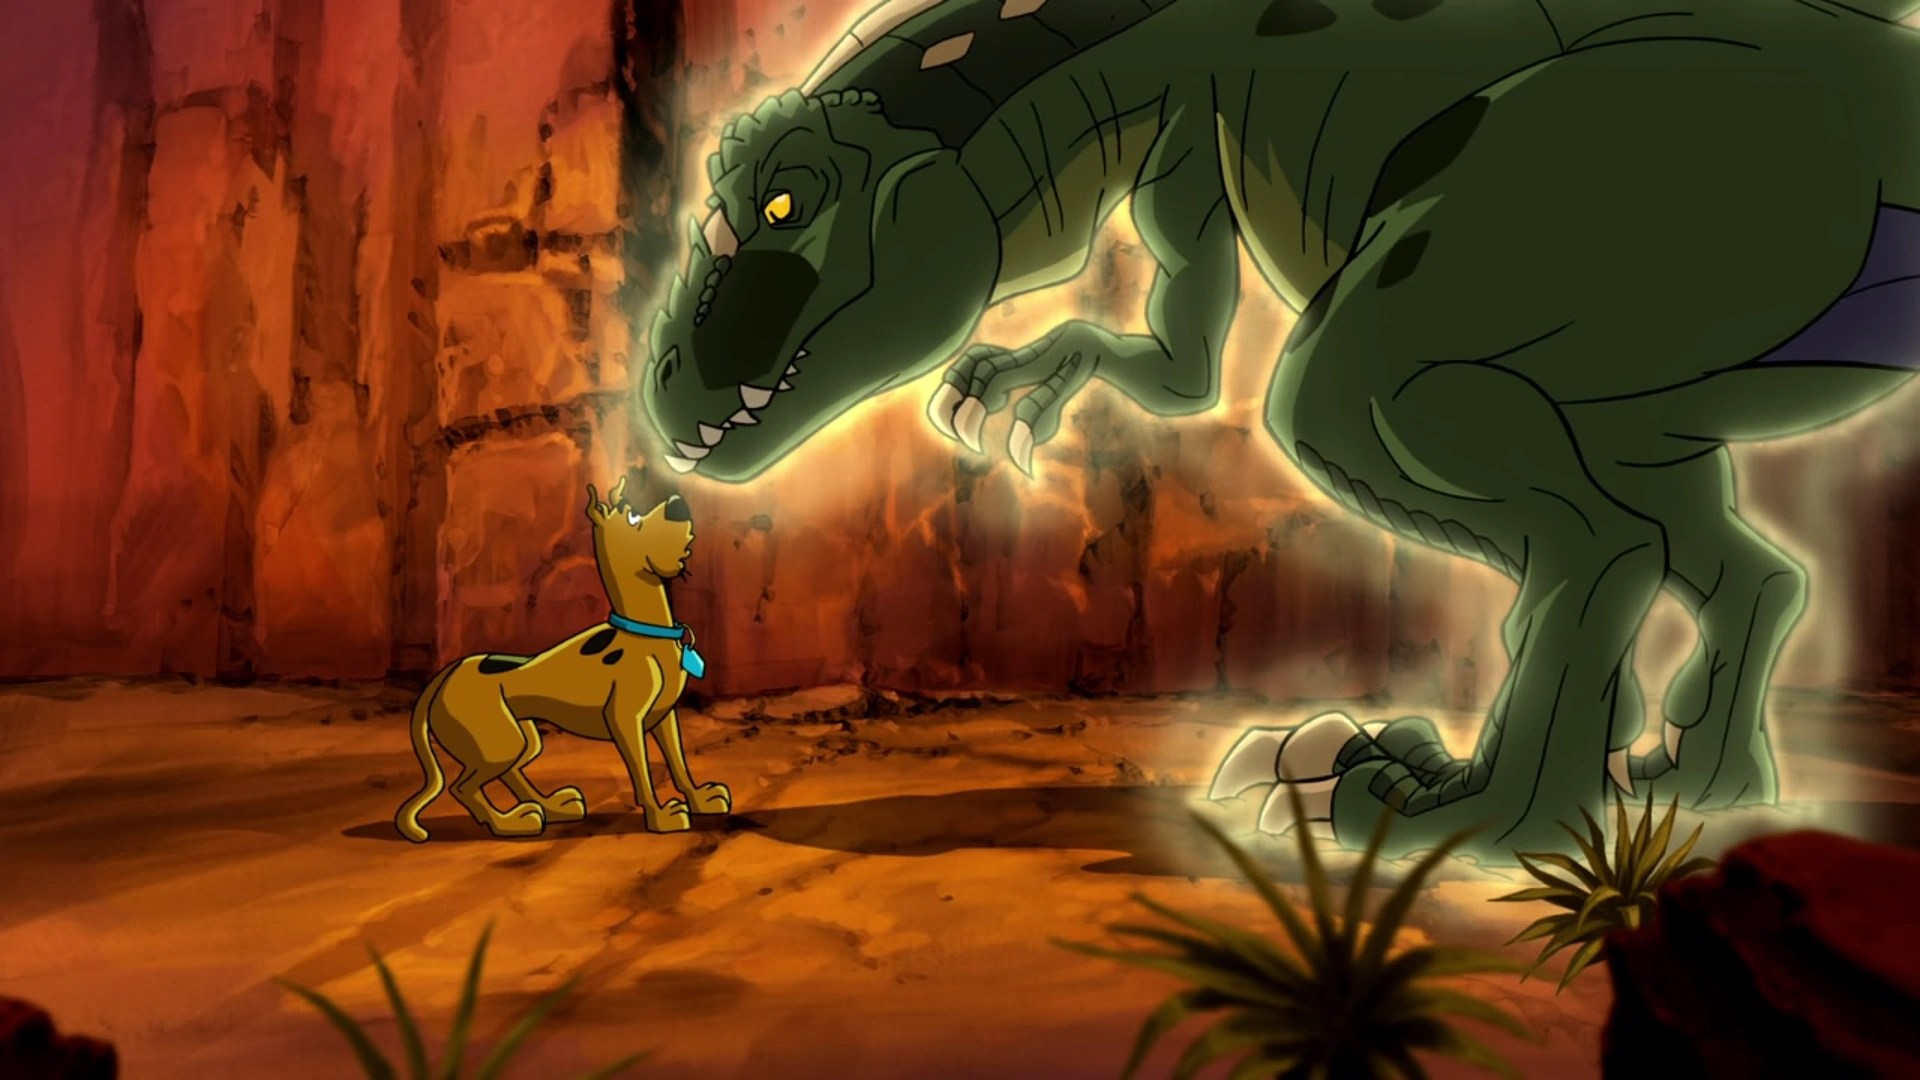 Wallpaper Monster Inc 3d Scooby Doo Legend Of The Phantosaur Scoobypedia